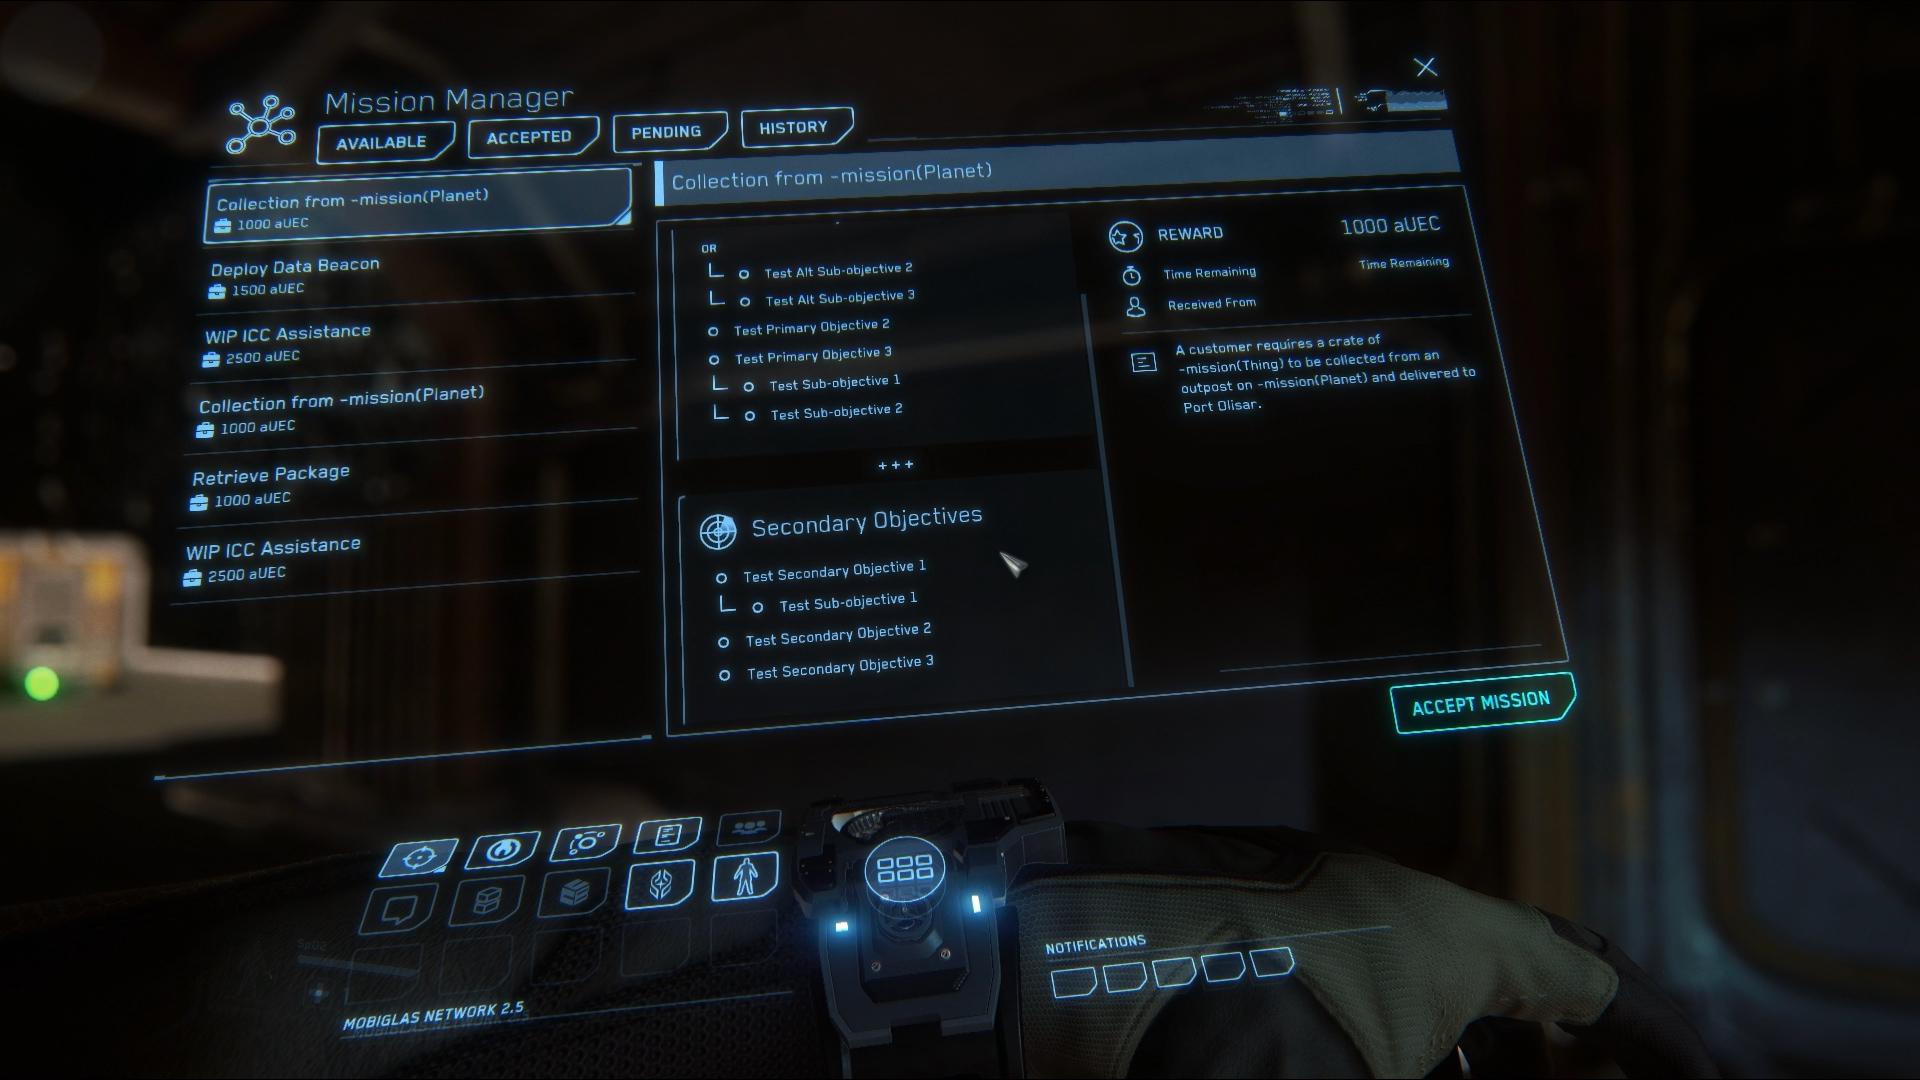 Mission_manager_01.jpg